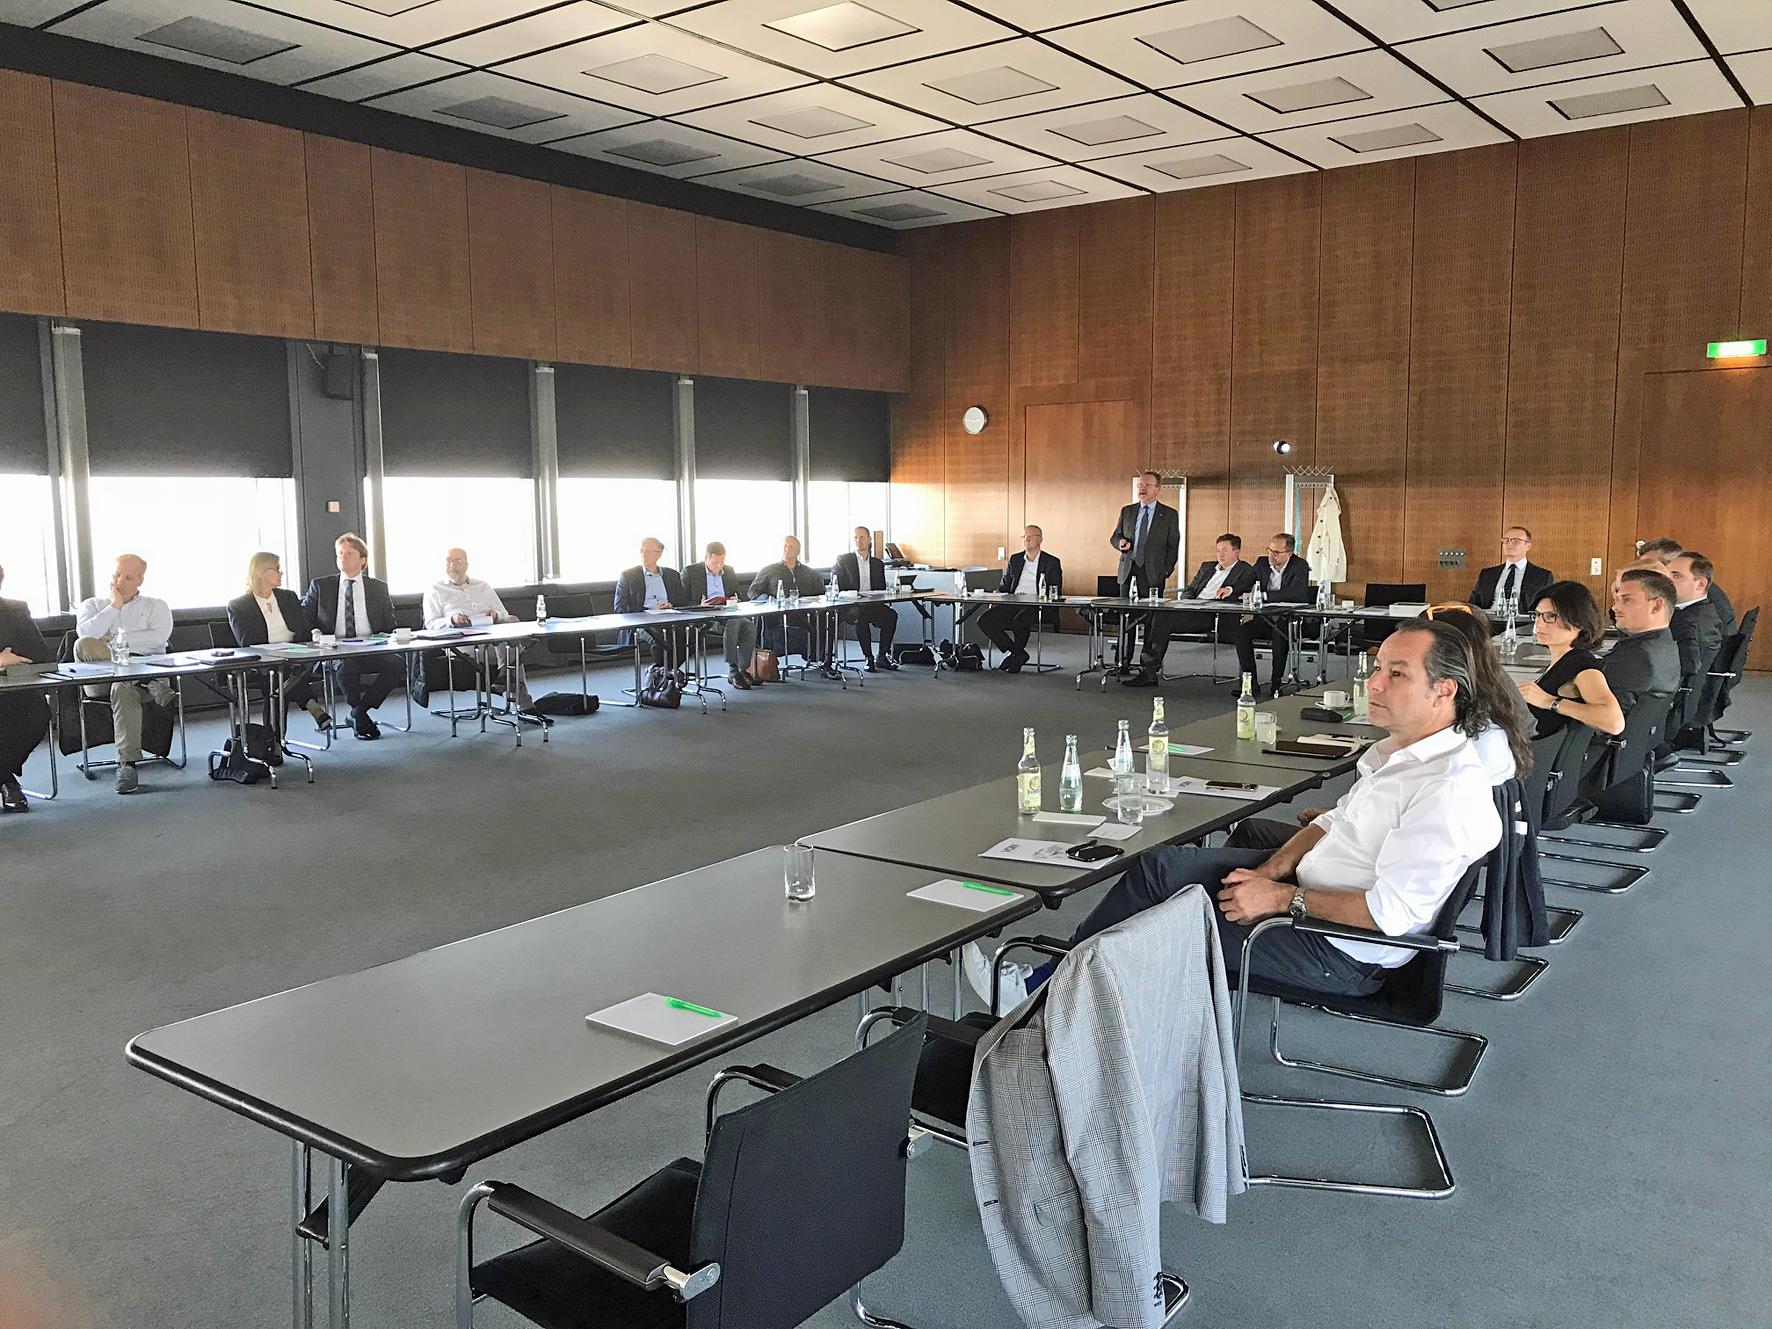 VDM-2018-PM-Export-Meeting1